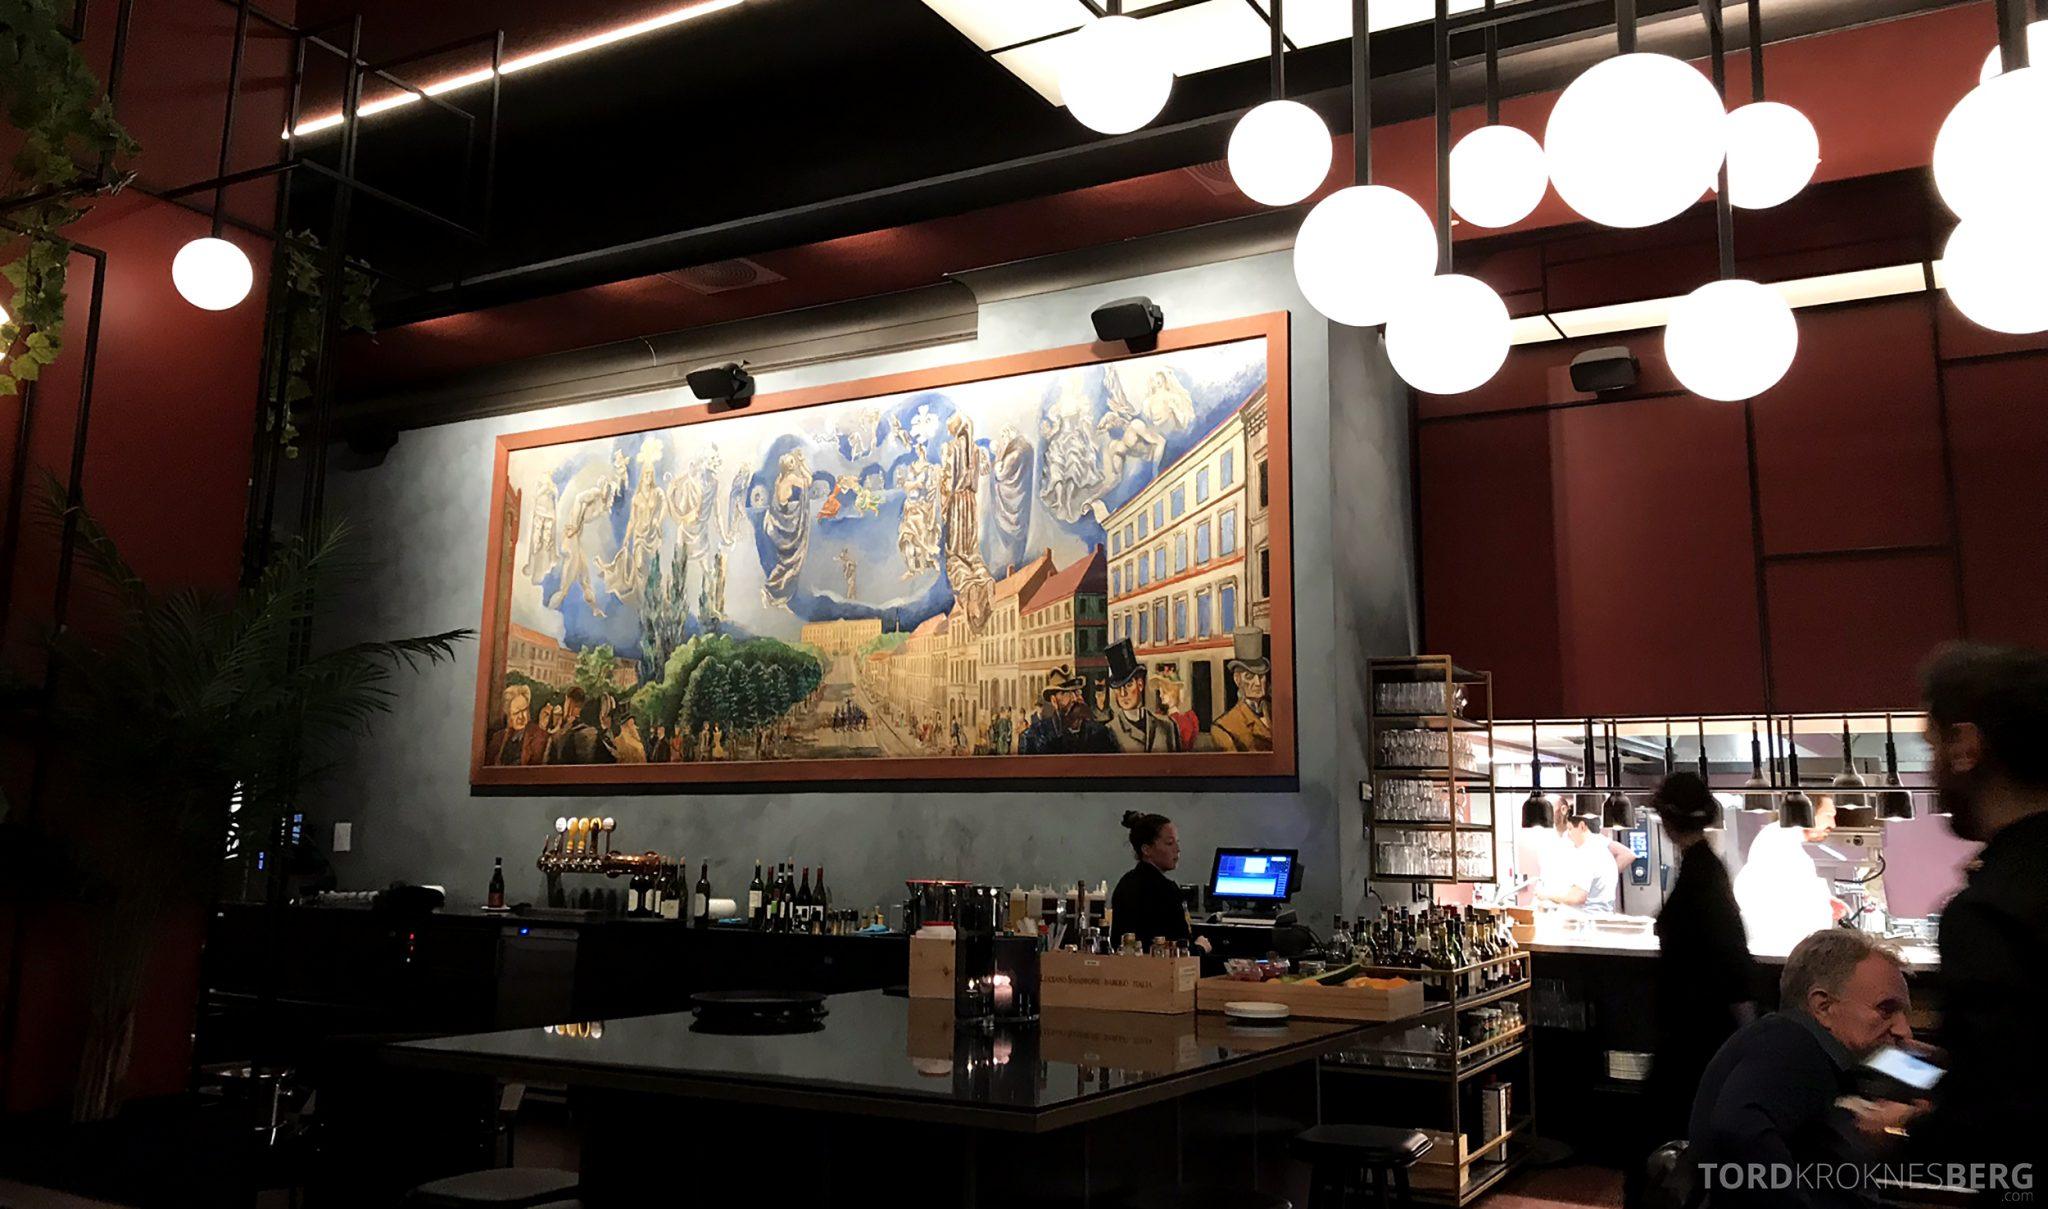 Grand Café Oslo kunst